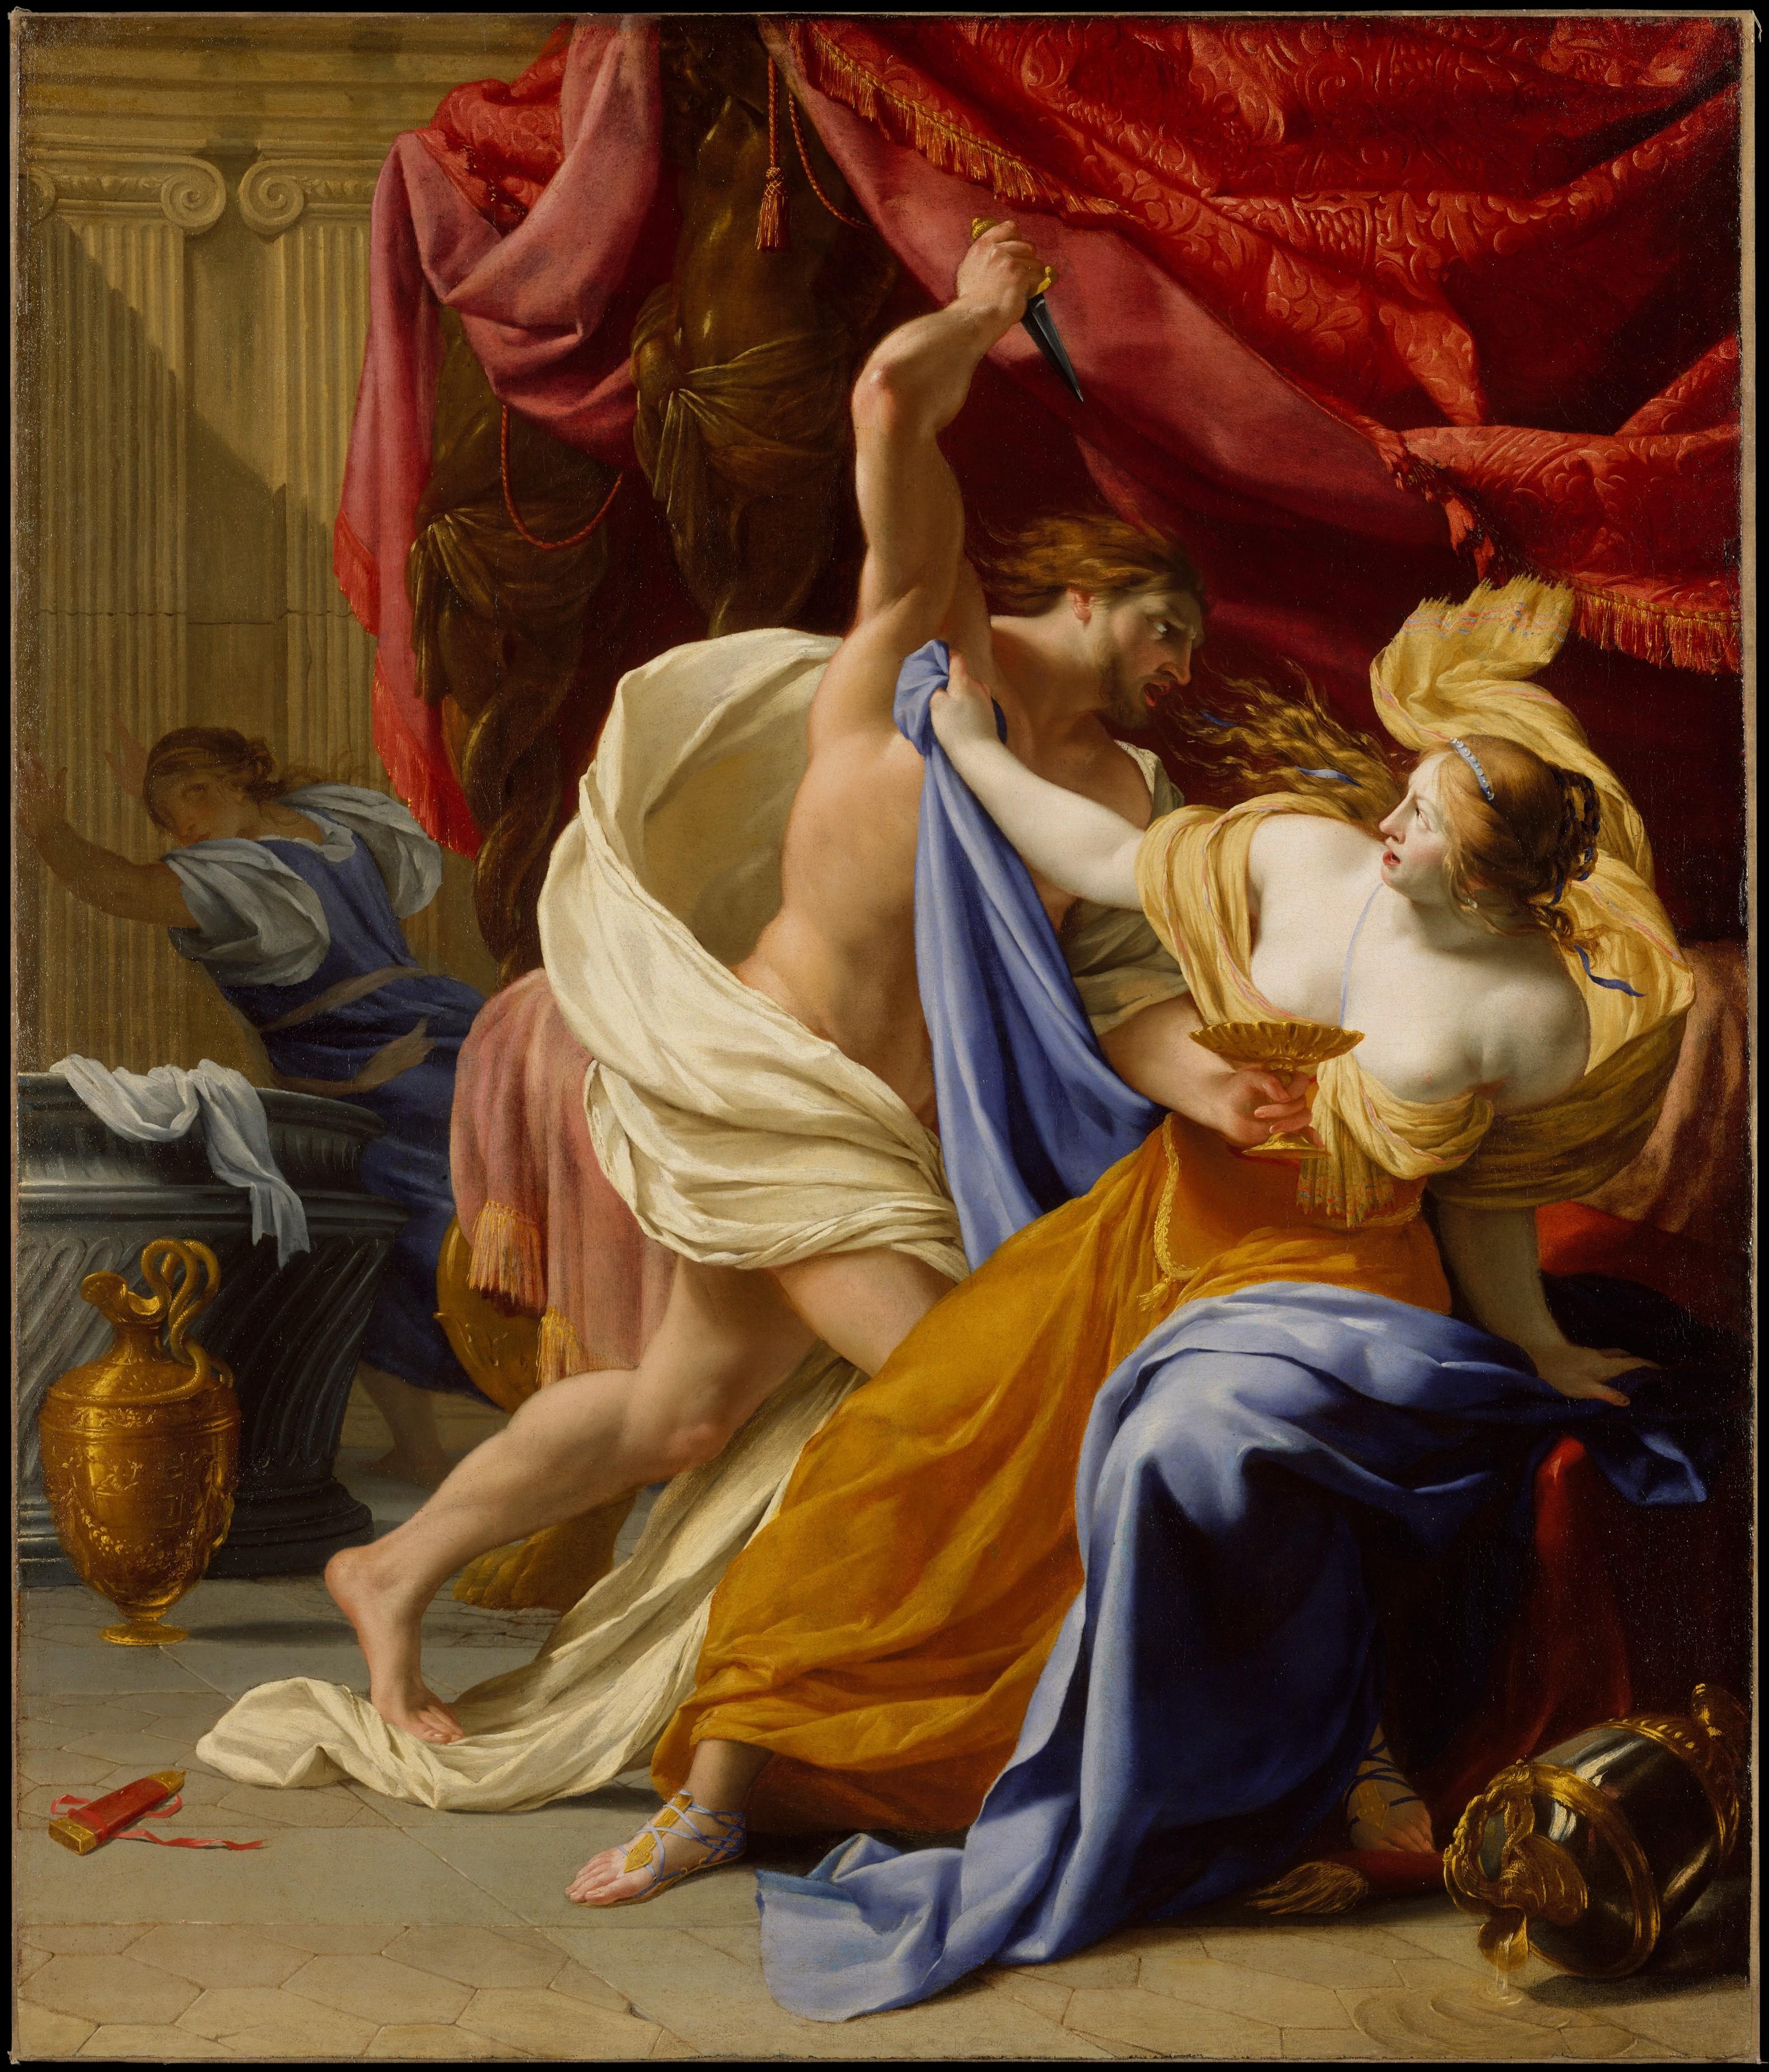 Deuteronomy 22:28-29 on rape and marriage?